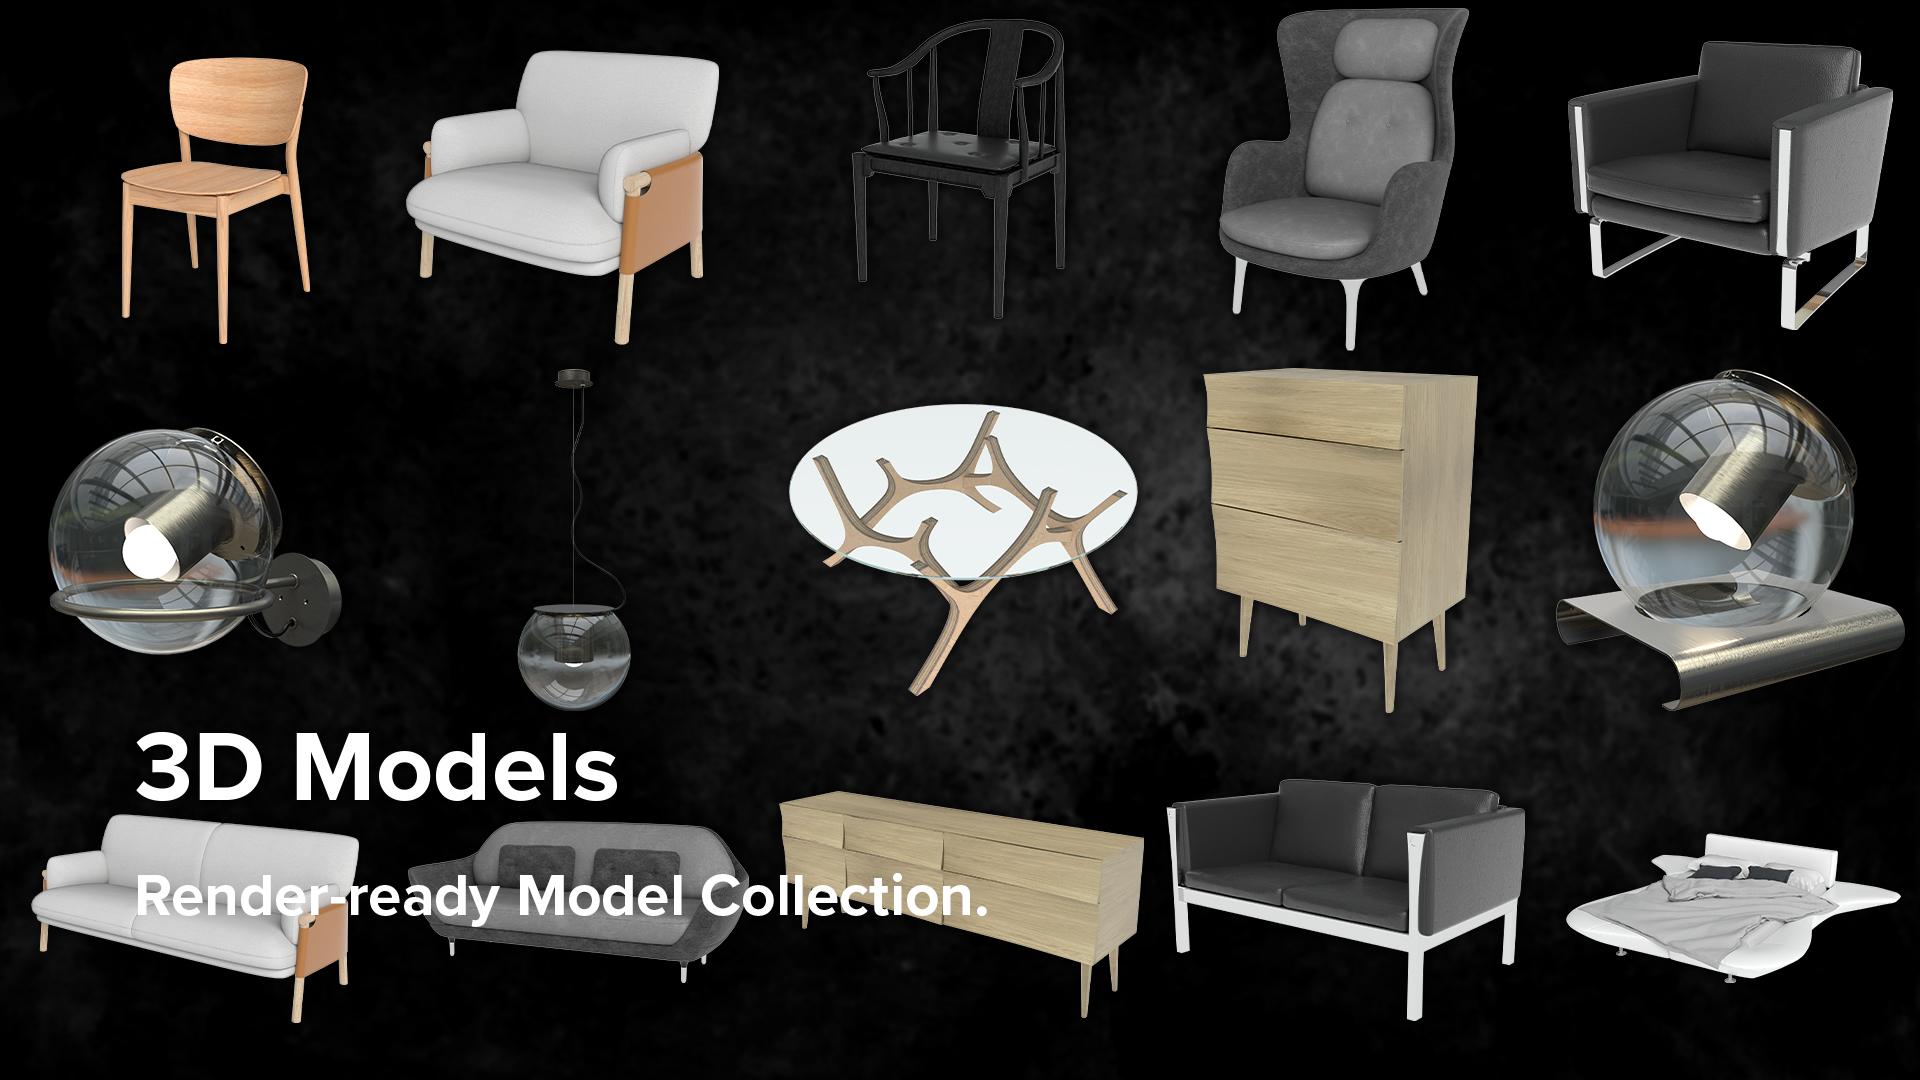 3D Models Preview 4.jpg